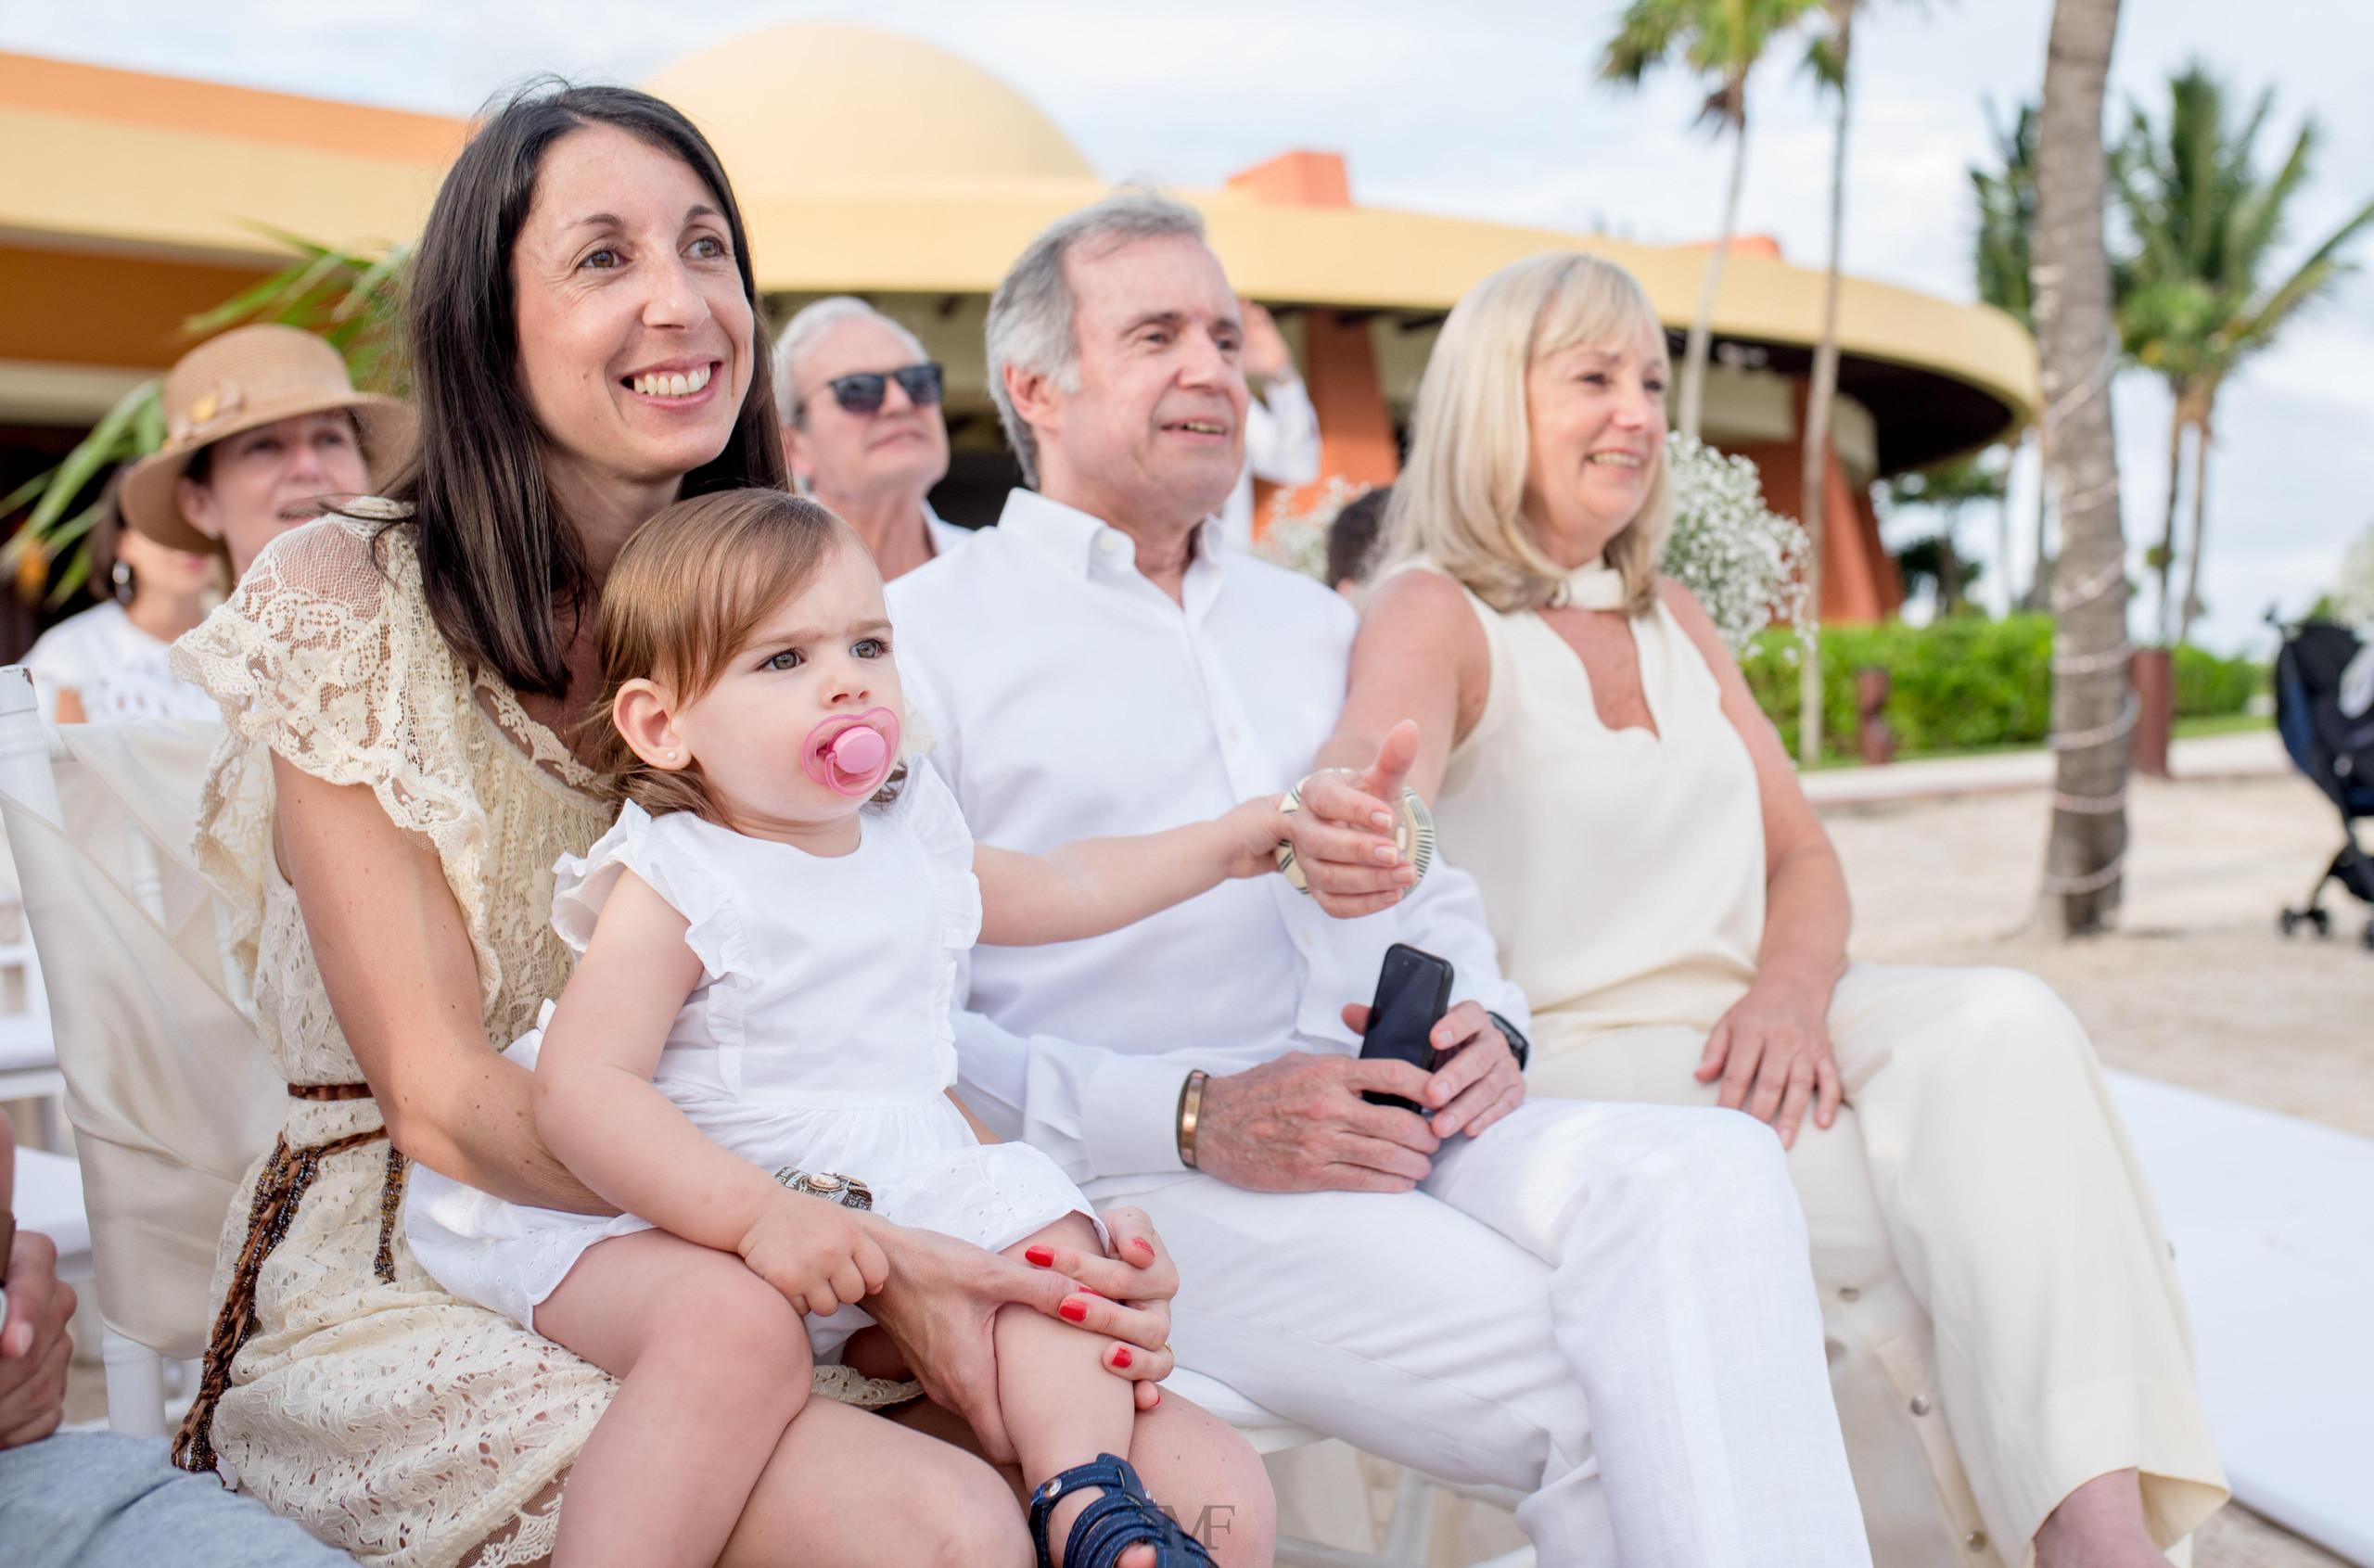 Fotografia de bodas en Playa del Carmen, Hotel @barcelomayagrandresort